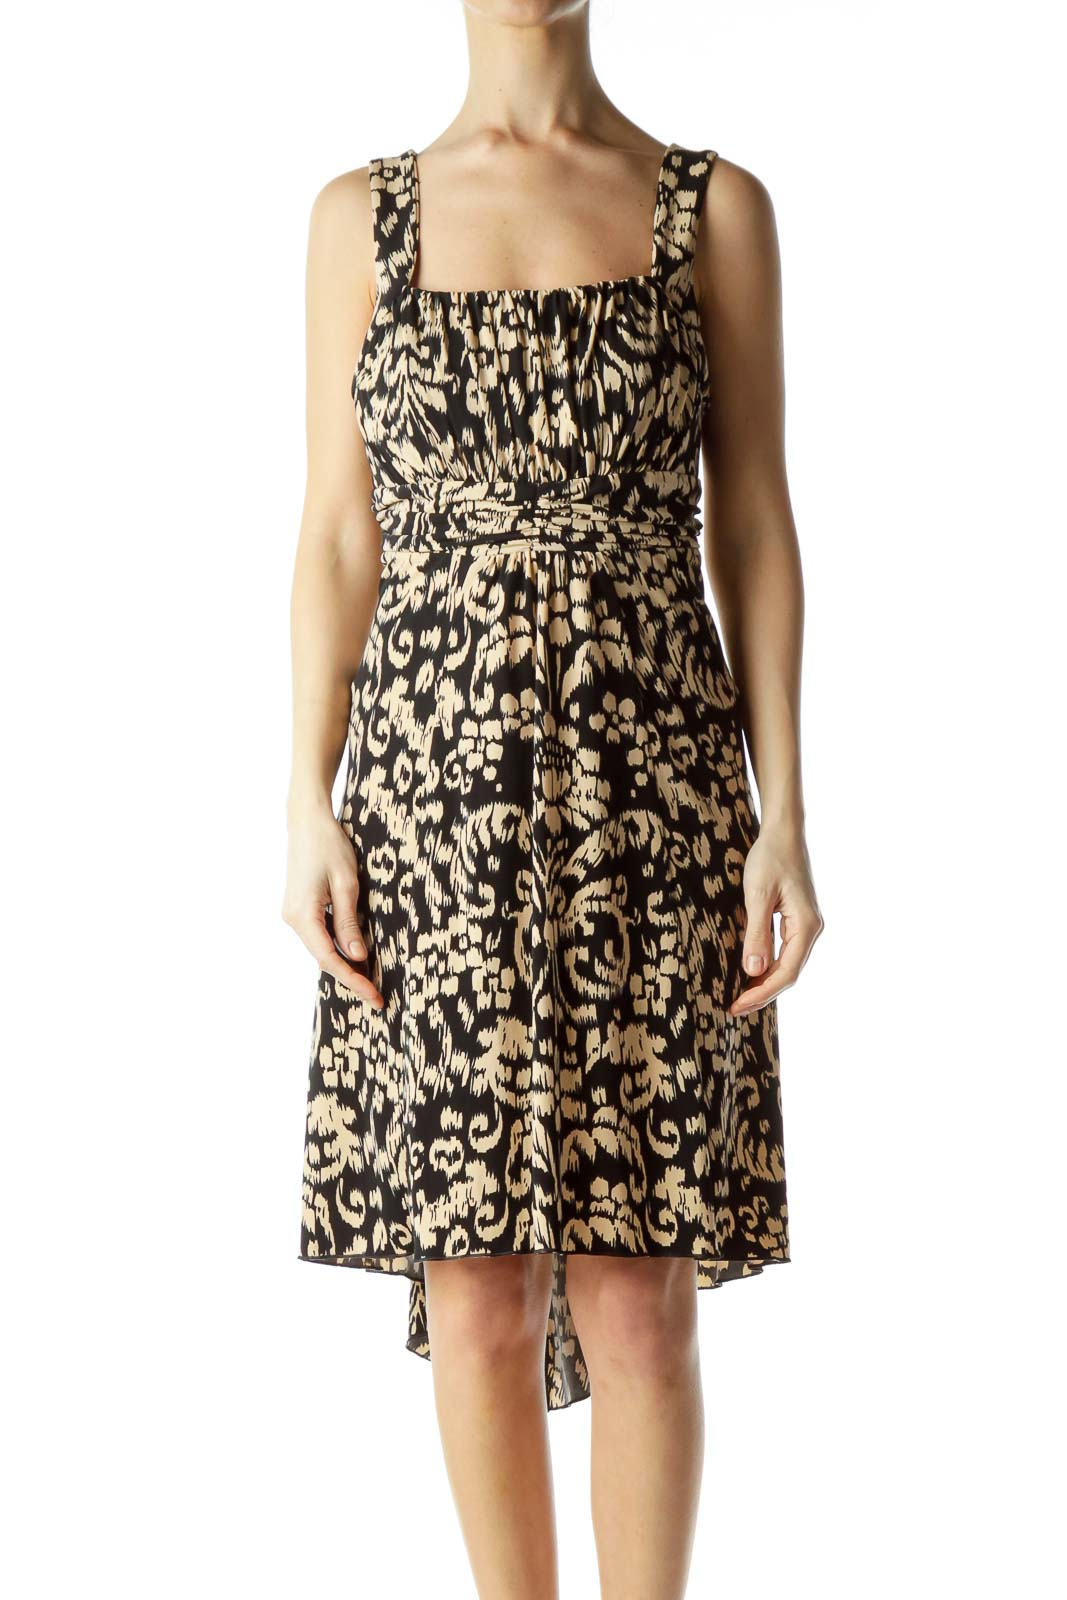 Black Beige Printed Elastic Day Dress Front